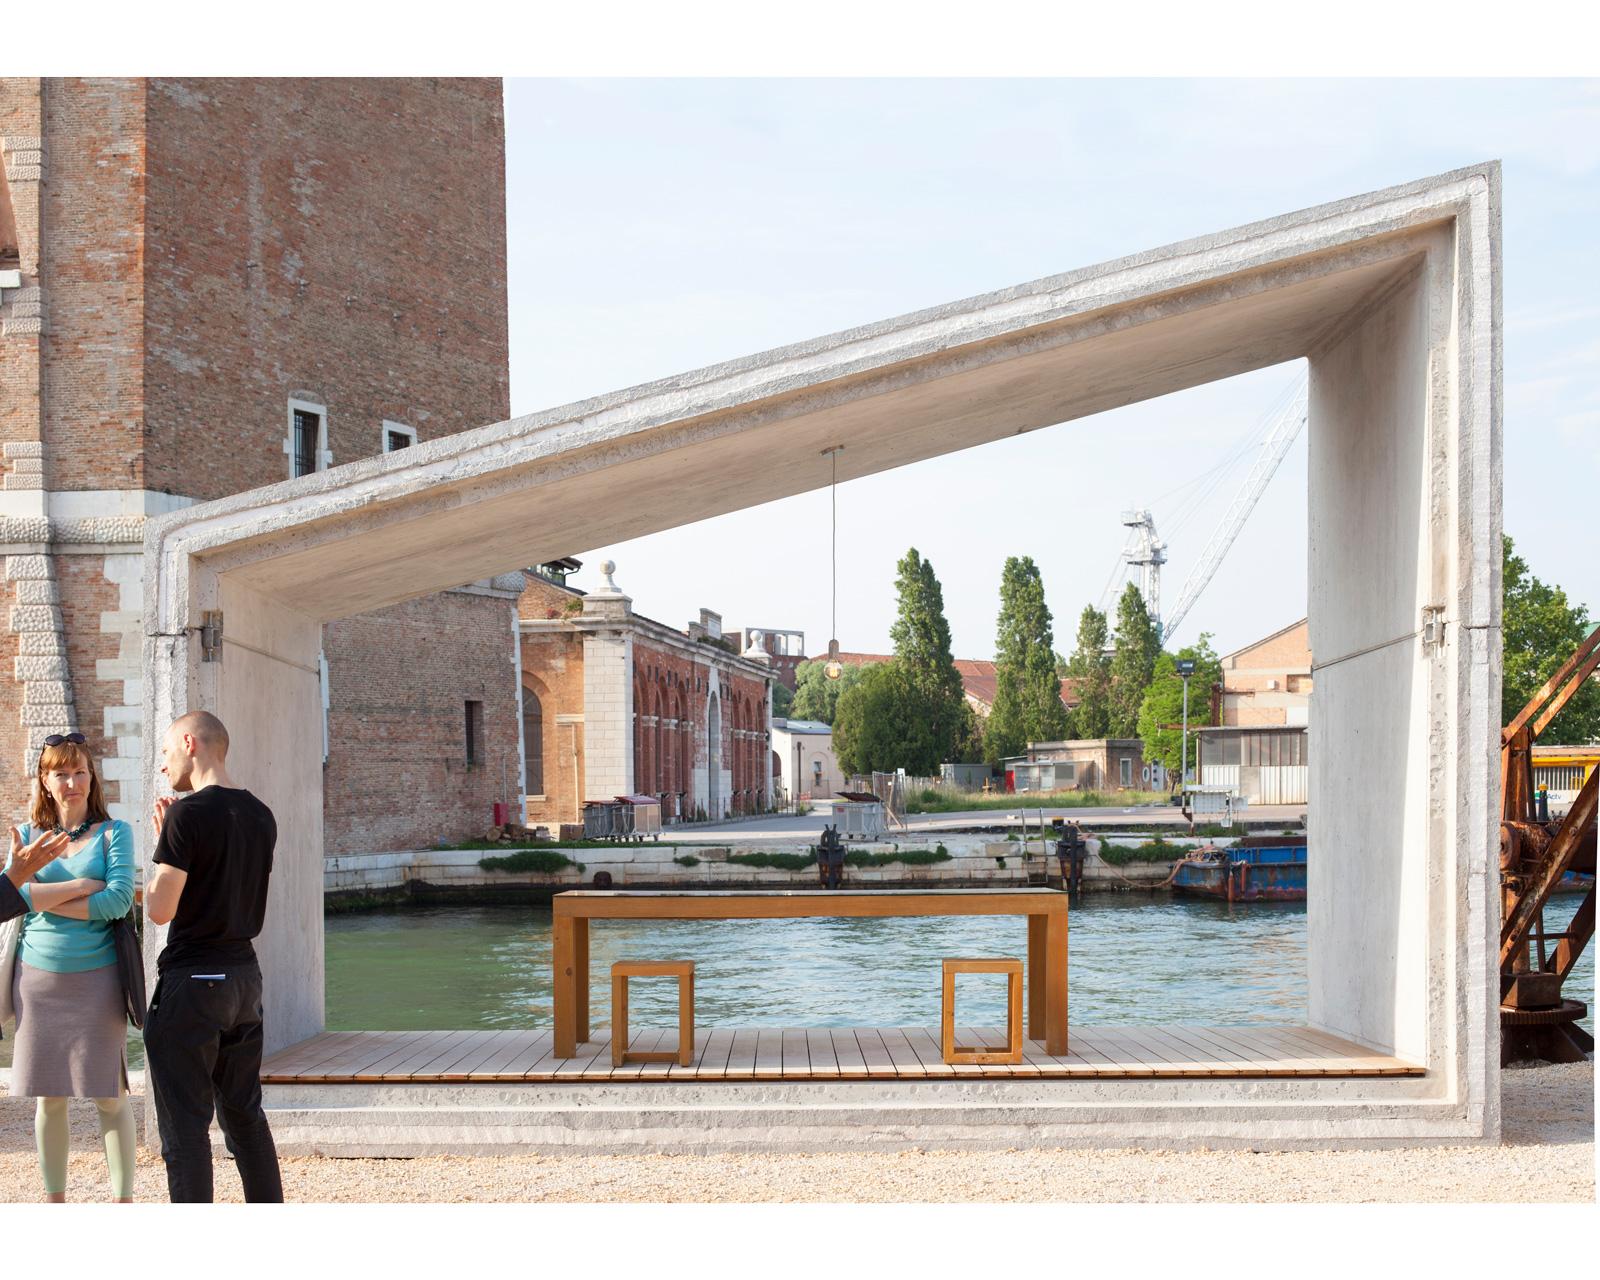 La biennale venezia Summary Architecture Gomos System